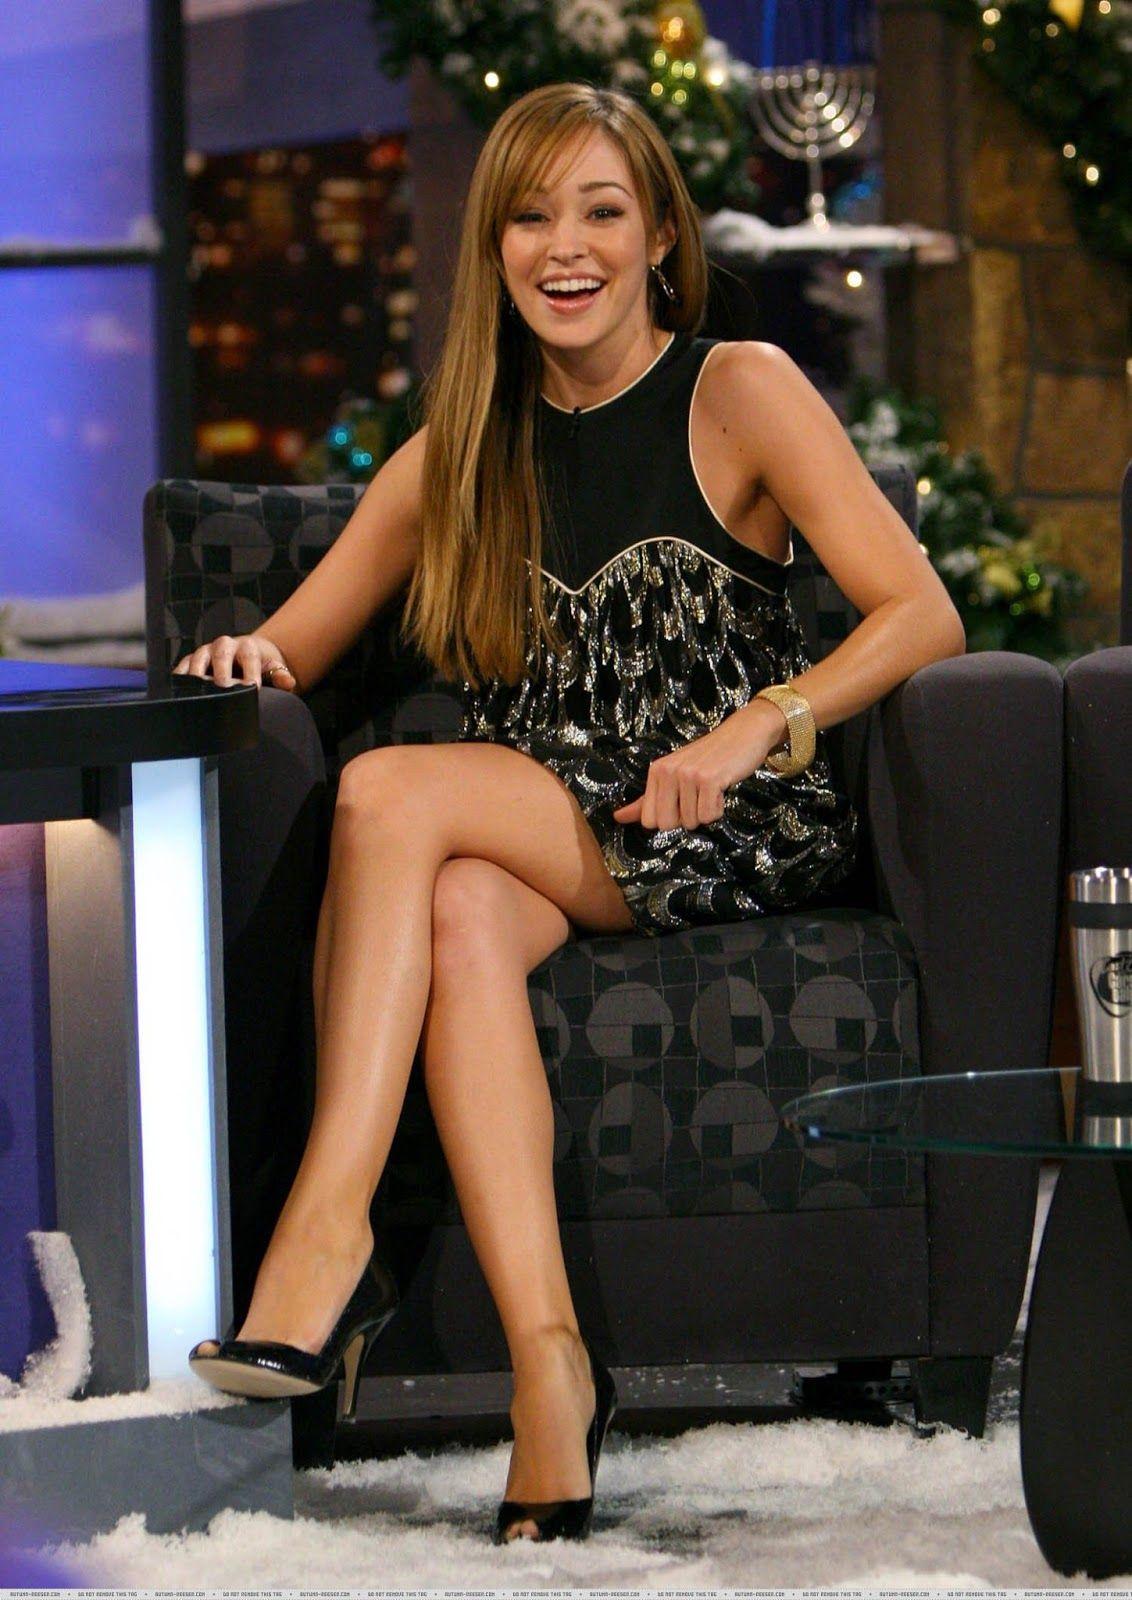 Amber Lancaster Entourage autumn reeser | great legs, fashion, amazing women